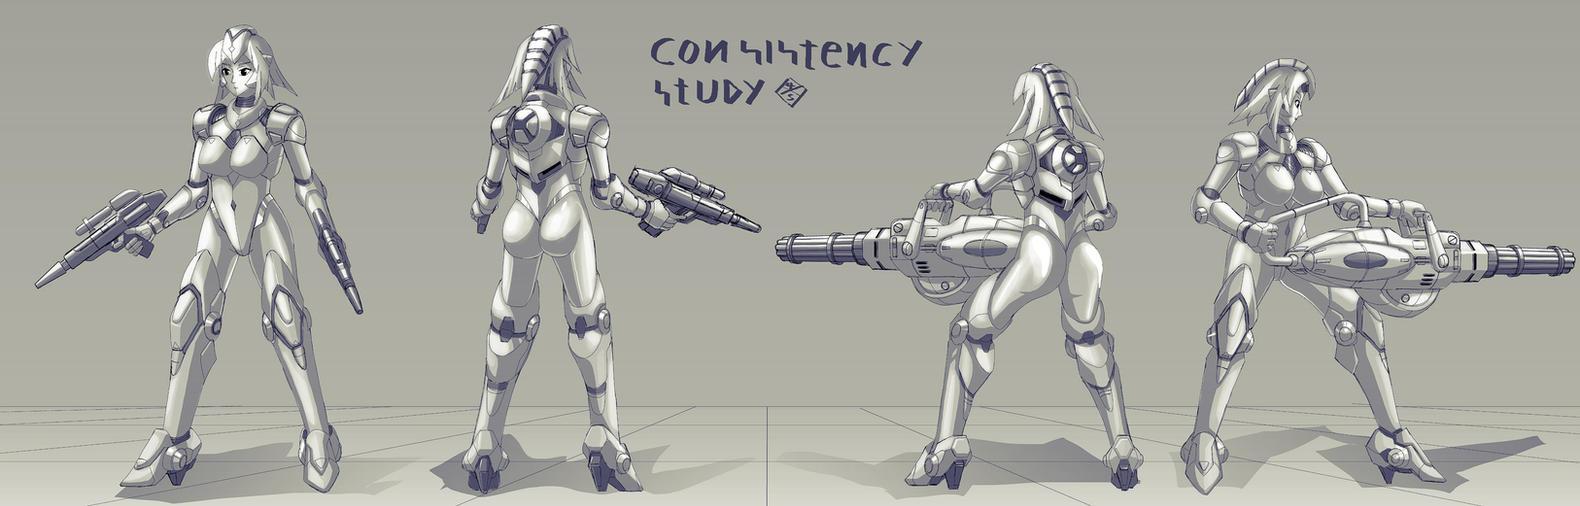 Consistency study by 4-X-S